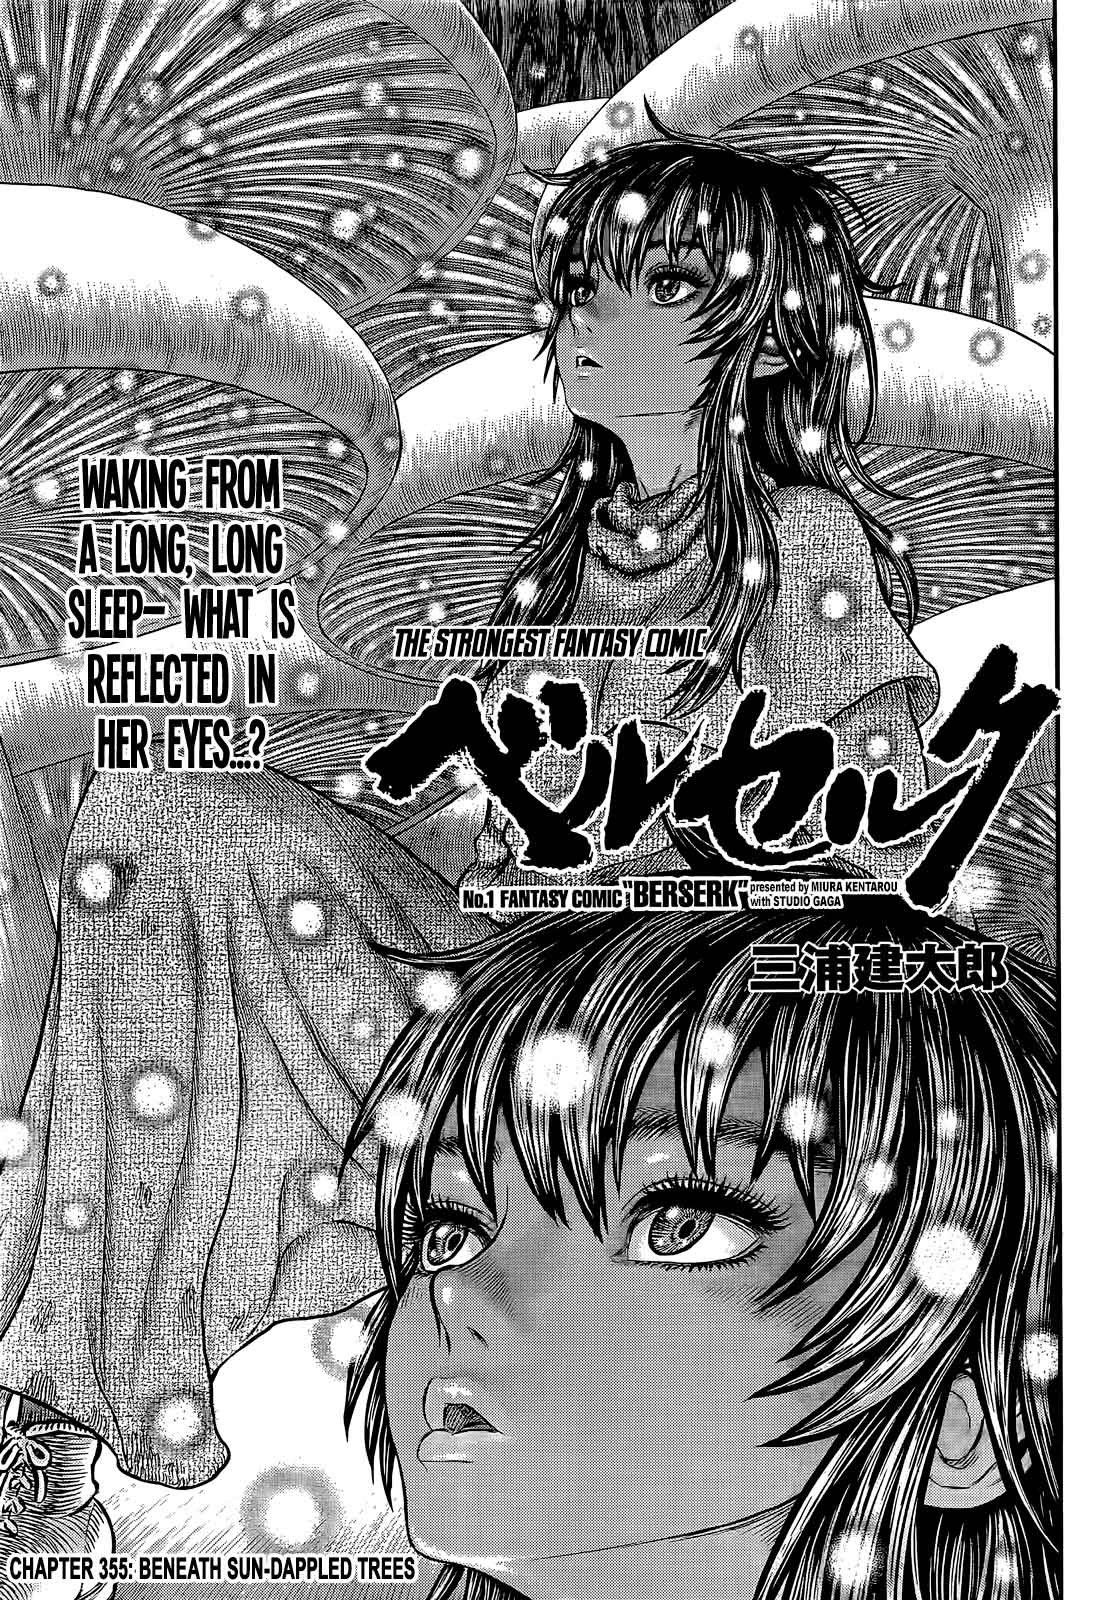 Berserk, Chapter 355 - Berserk Manga Online